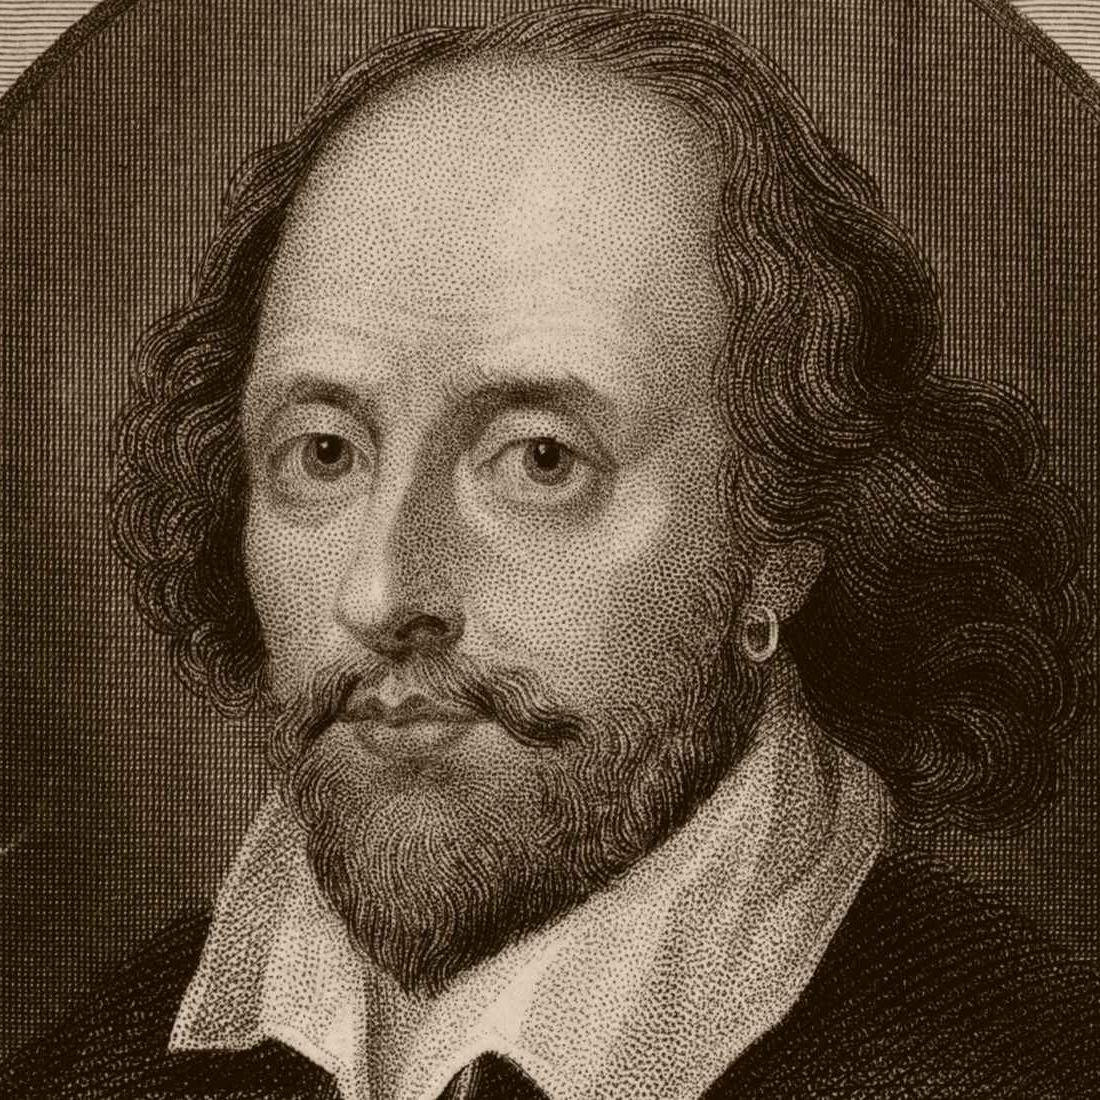 Картинки по запросу Шекспир родился 23 апреля